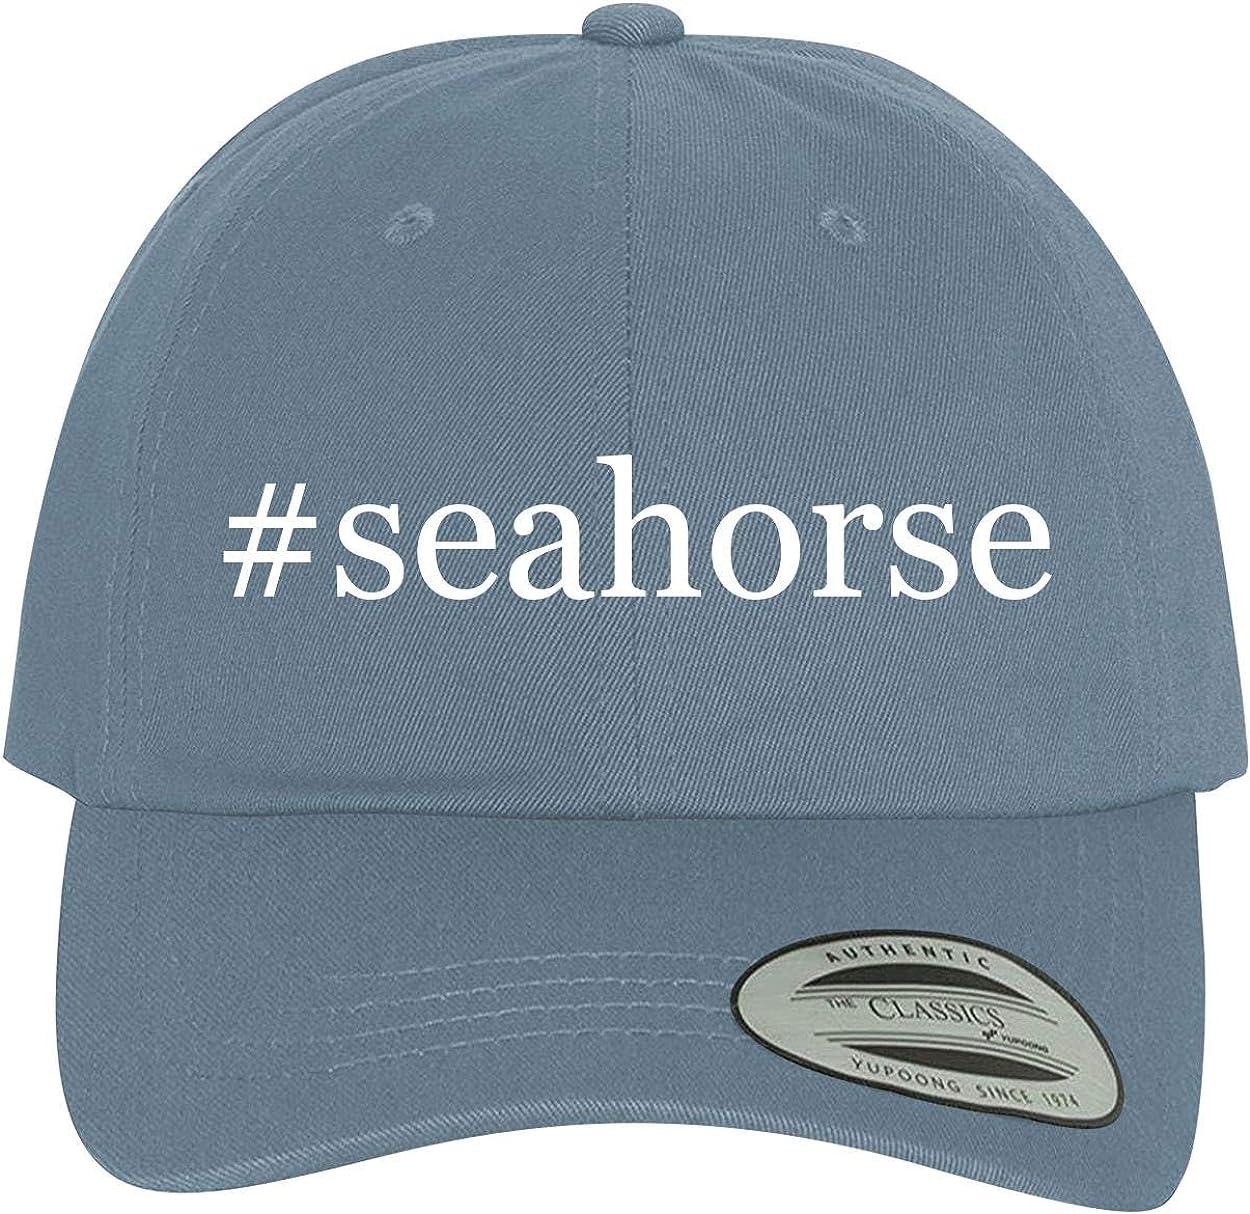 Comfortable Dad Hat Baseball Cap BH Cool Designs #Seahorse